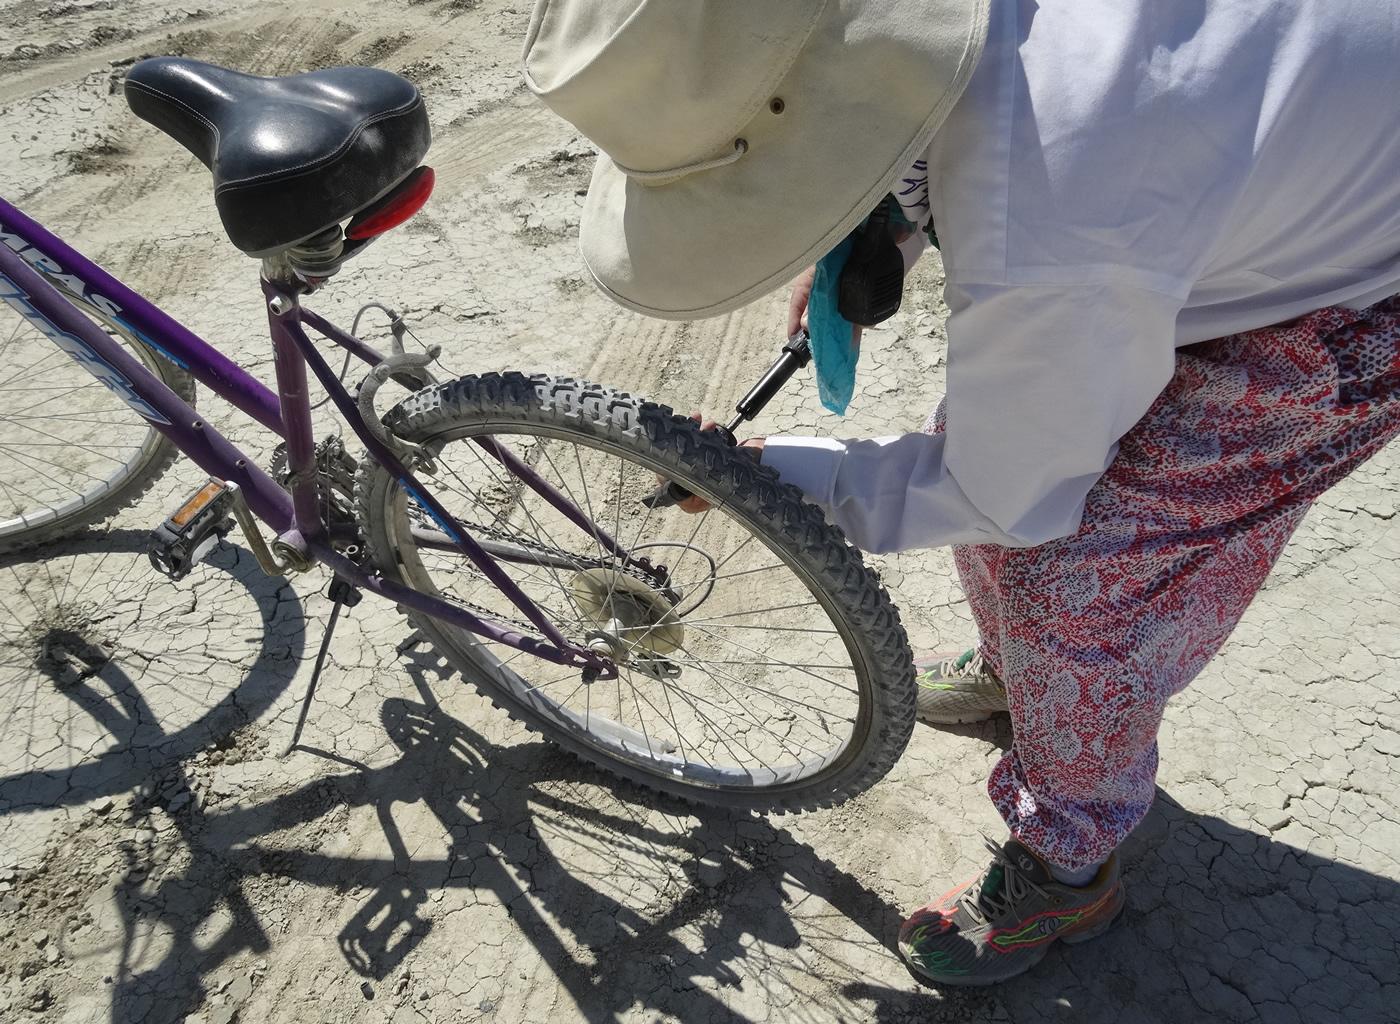 Bike Pump To The Rescue